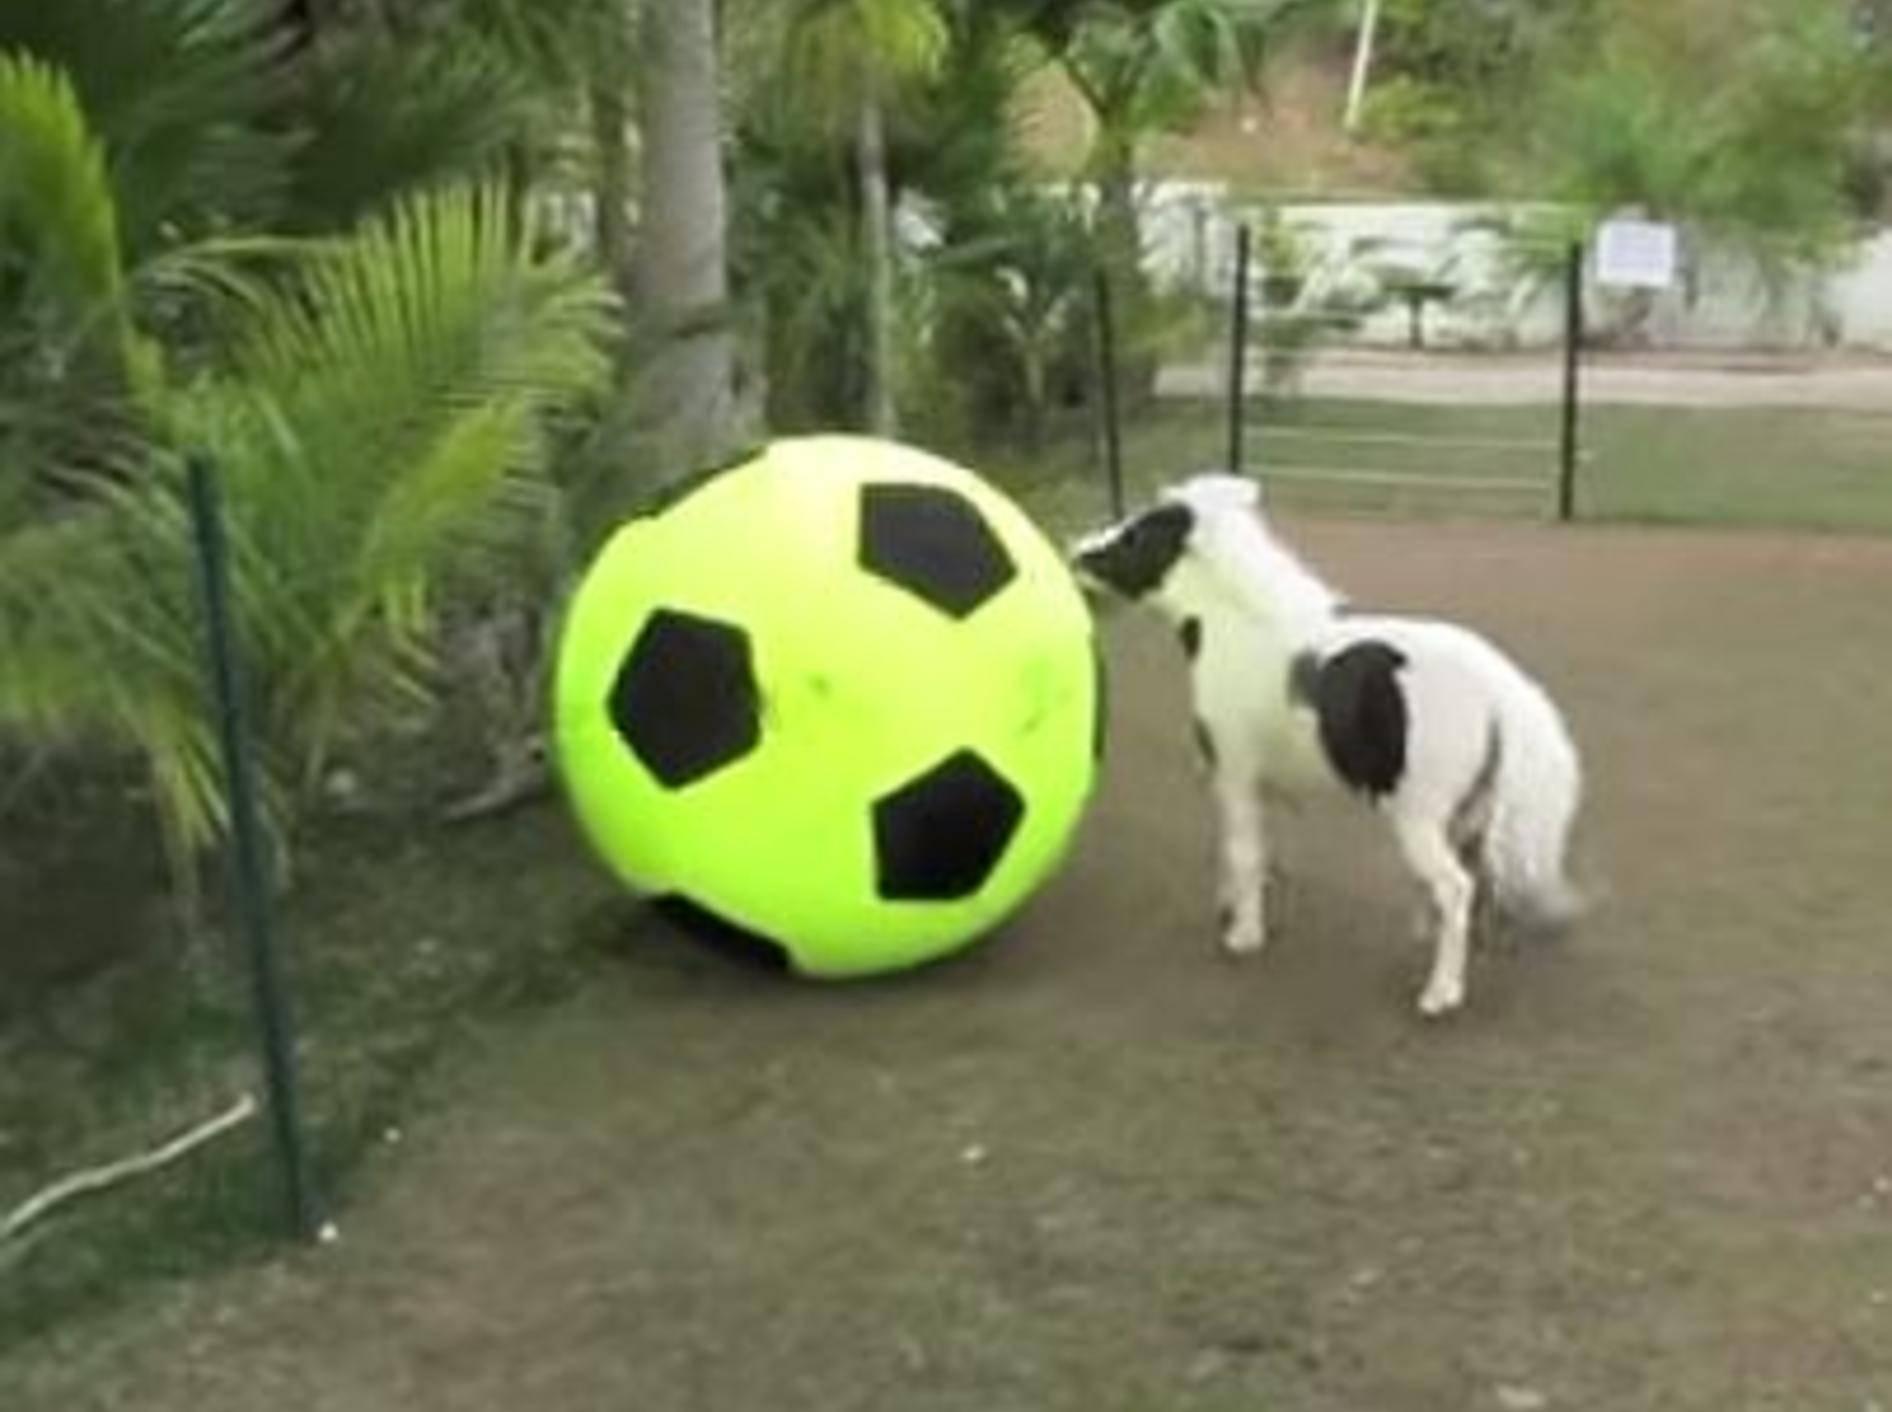 So niedlich: Minipony vs. Riesenball – Bild: Youtube / Einstein Minihorse